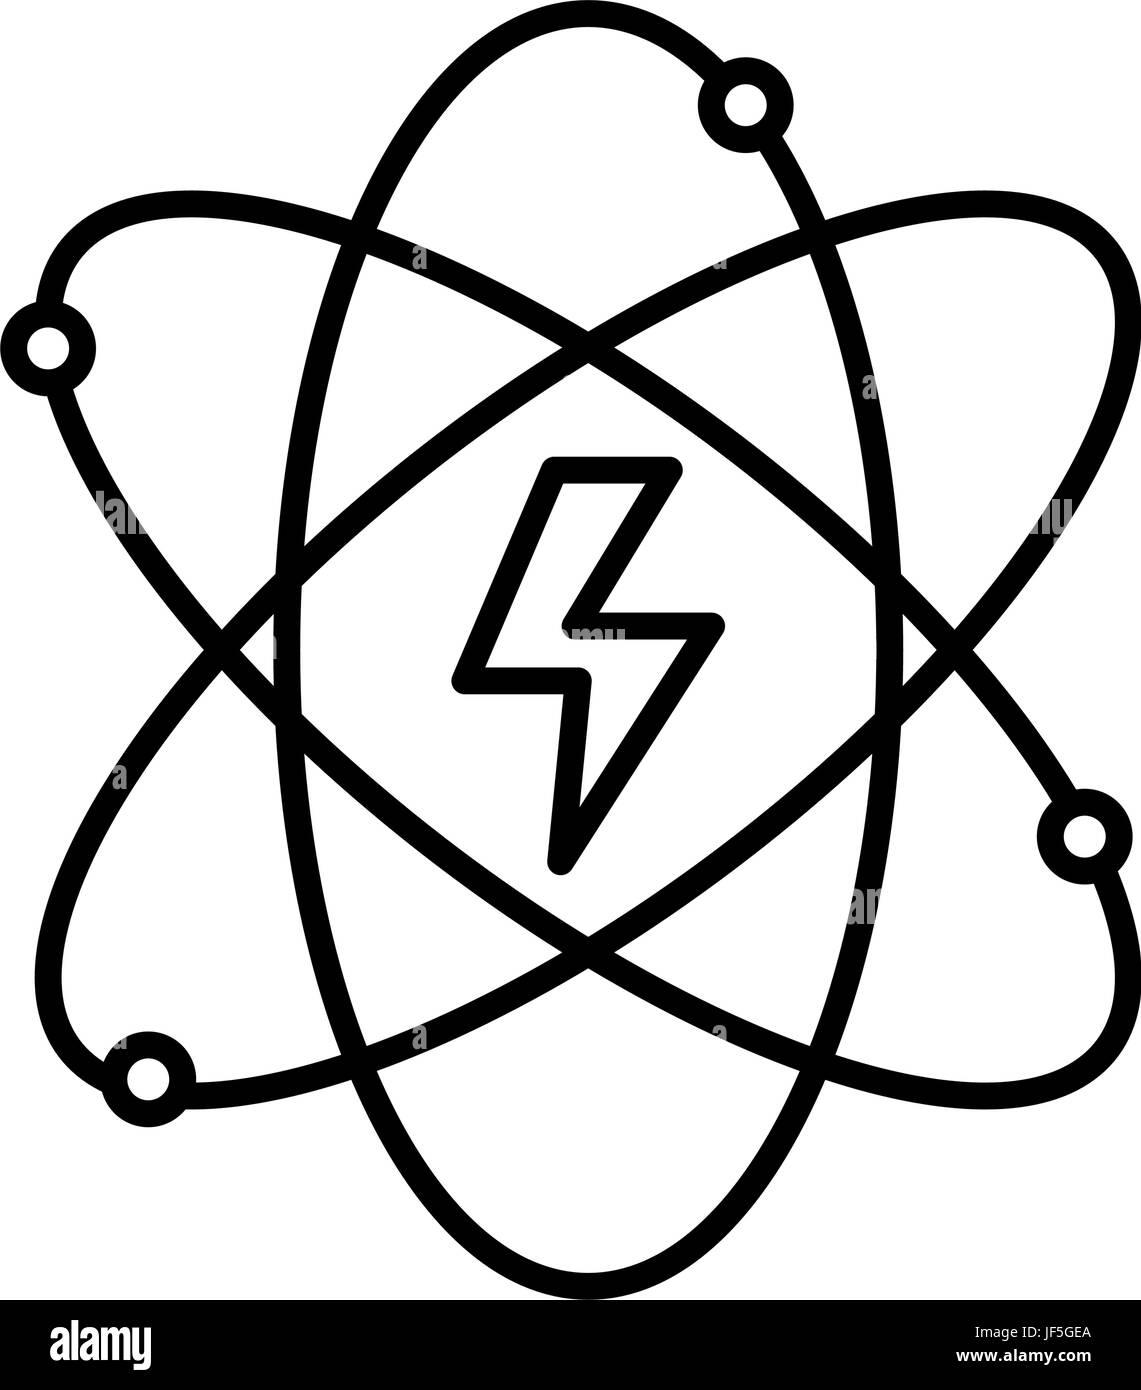 Line Energy Hazard Symbol Of Power Industry With Orbits Stock Vector